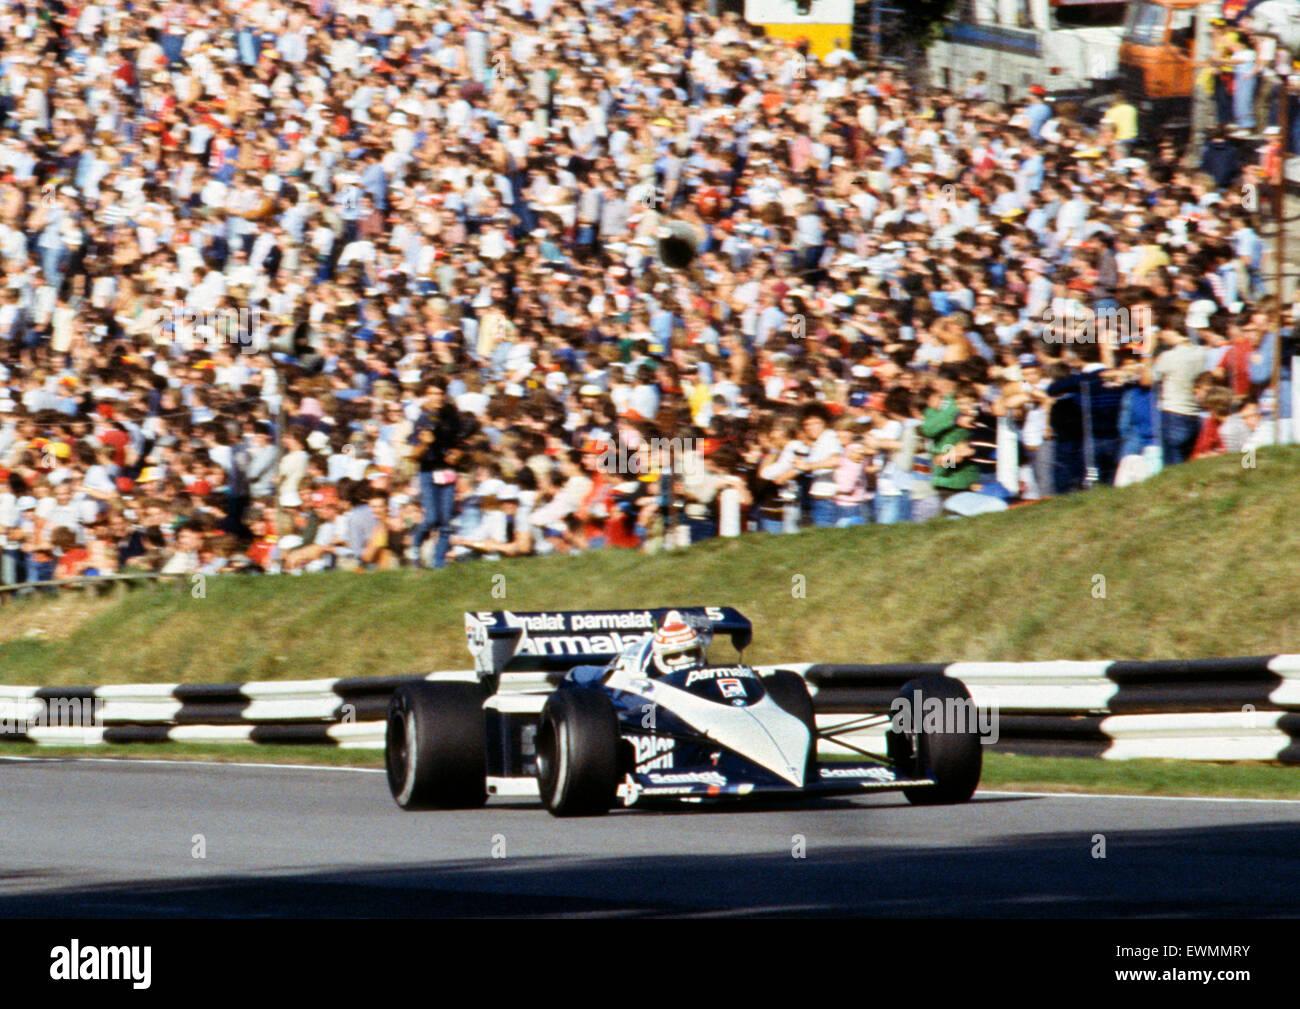 Brabham BT52, Nelson Piquet. 1983 GP of Europe Brands Hatch, 25/9/1983. - Stock Image